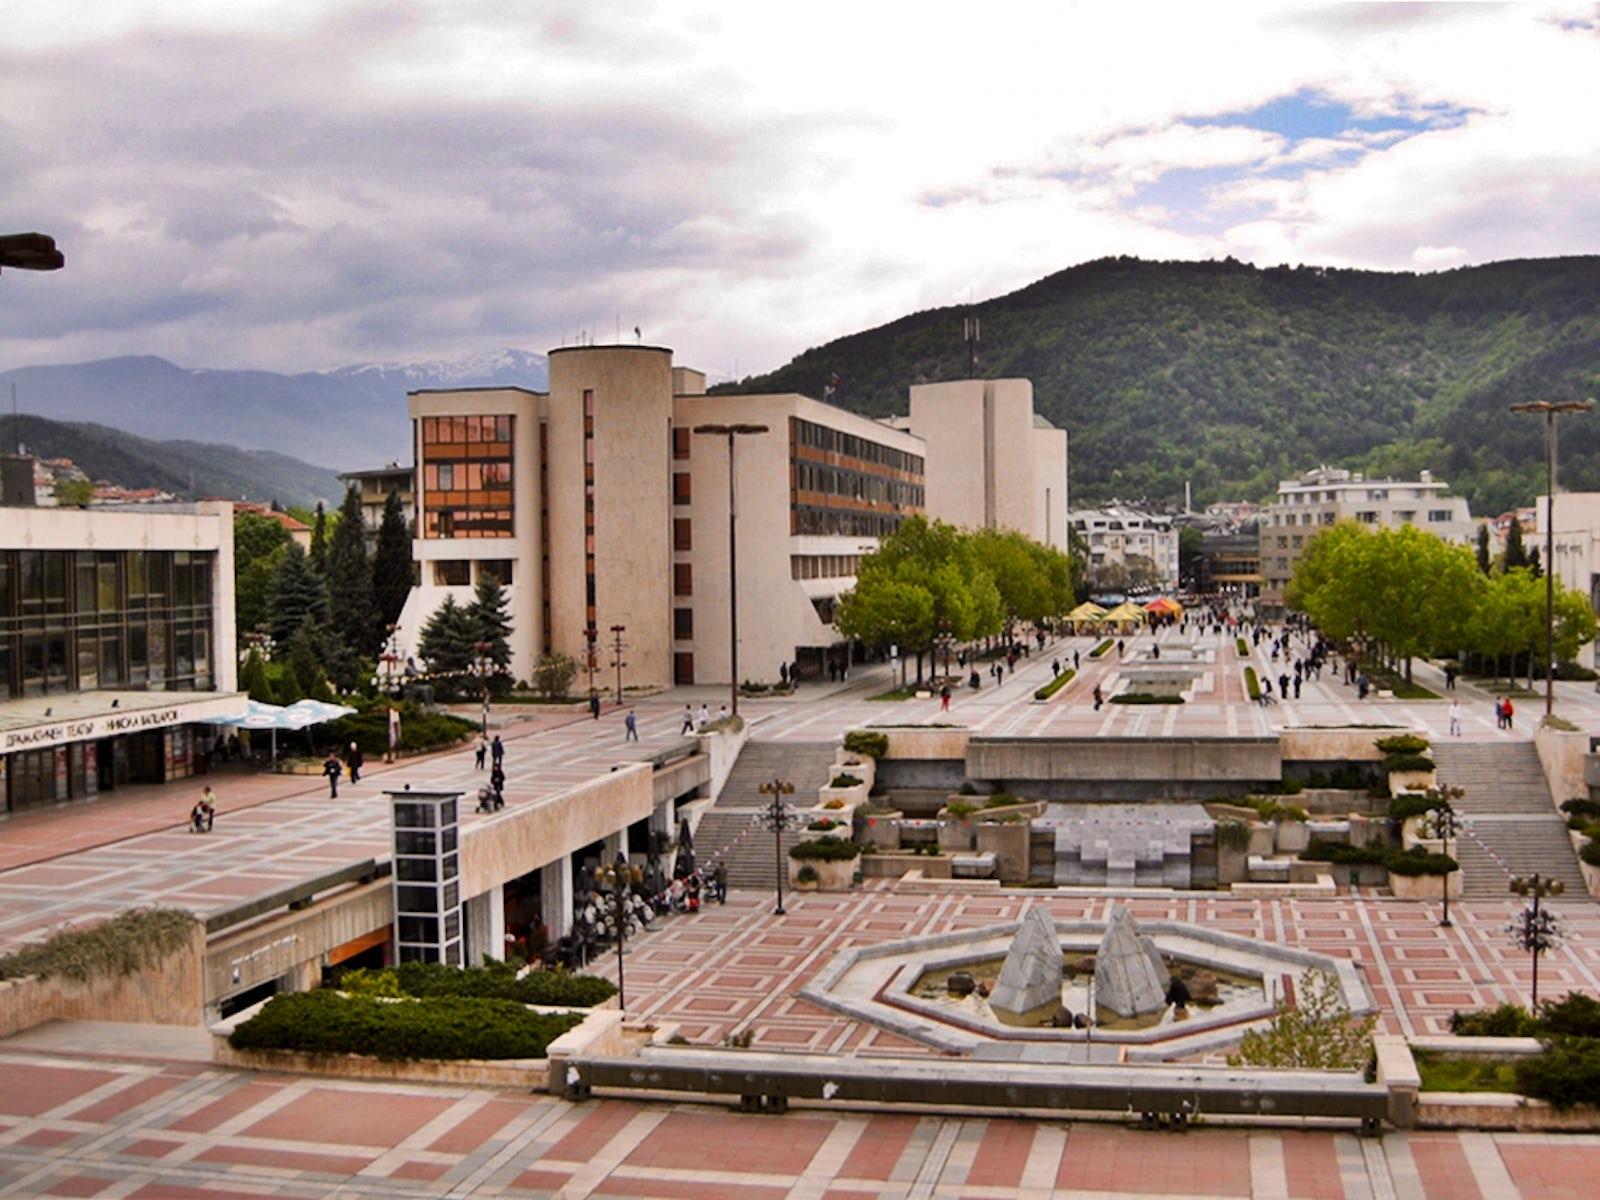 !i18n:en:data.cities:blagoevgrad.picture.caption